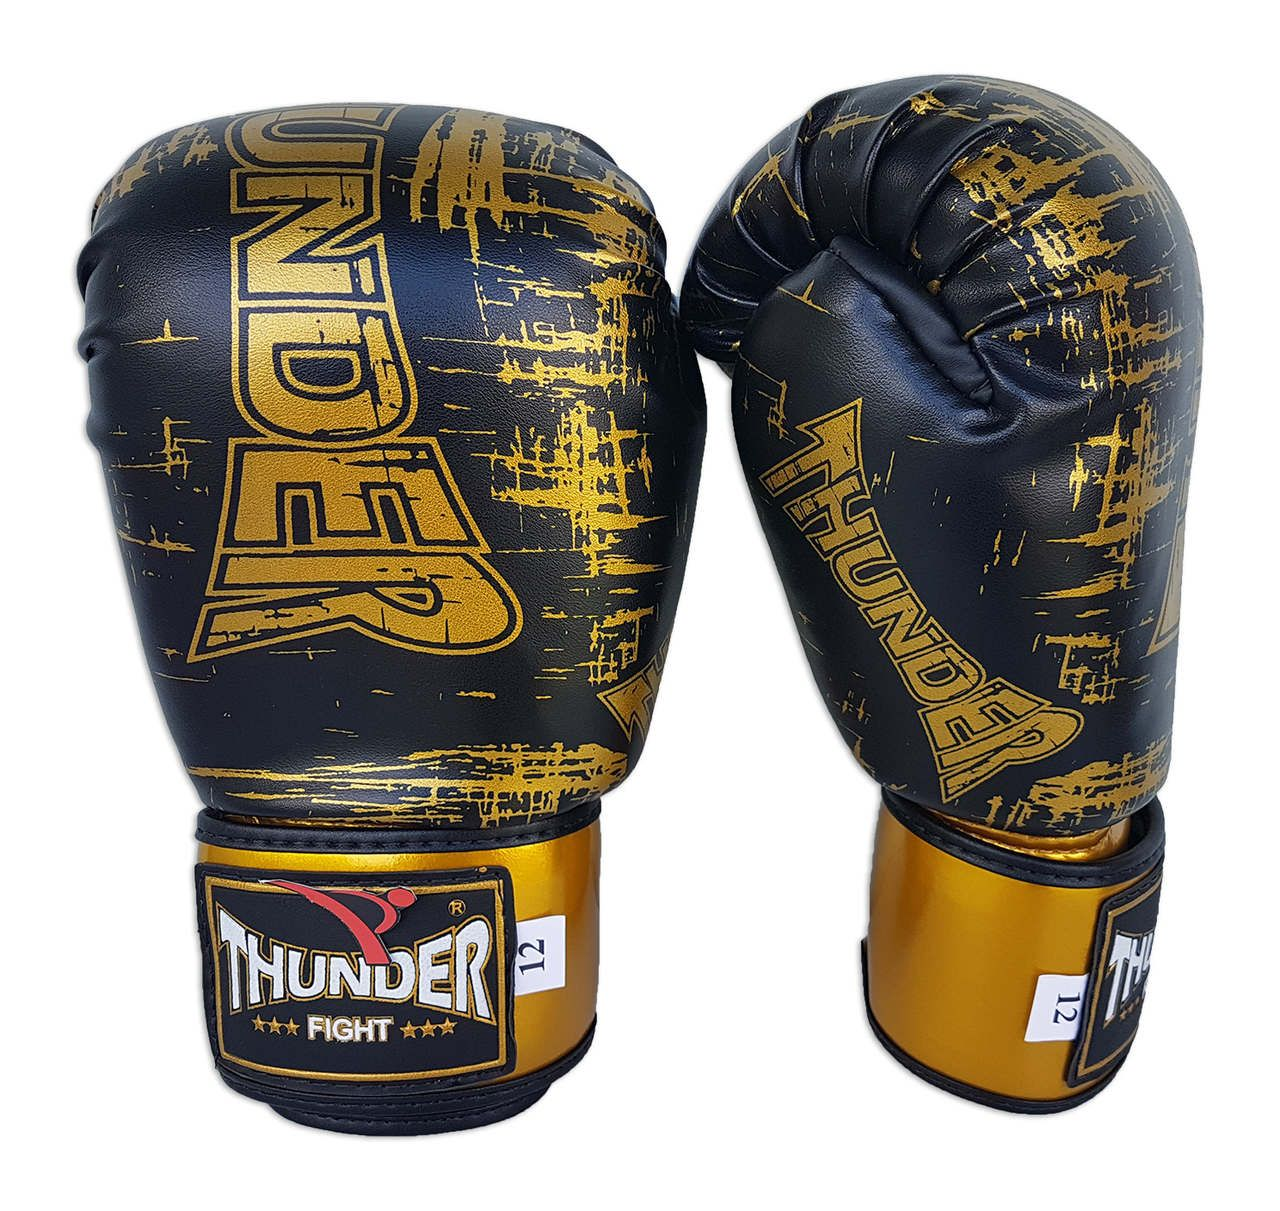 Super Kit de Muay Thai / Kickboxing 10oz - Caneleira M - Preto - Thunder Fight  - PRALUTA SHOP